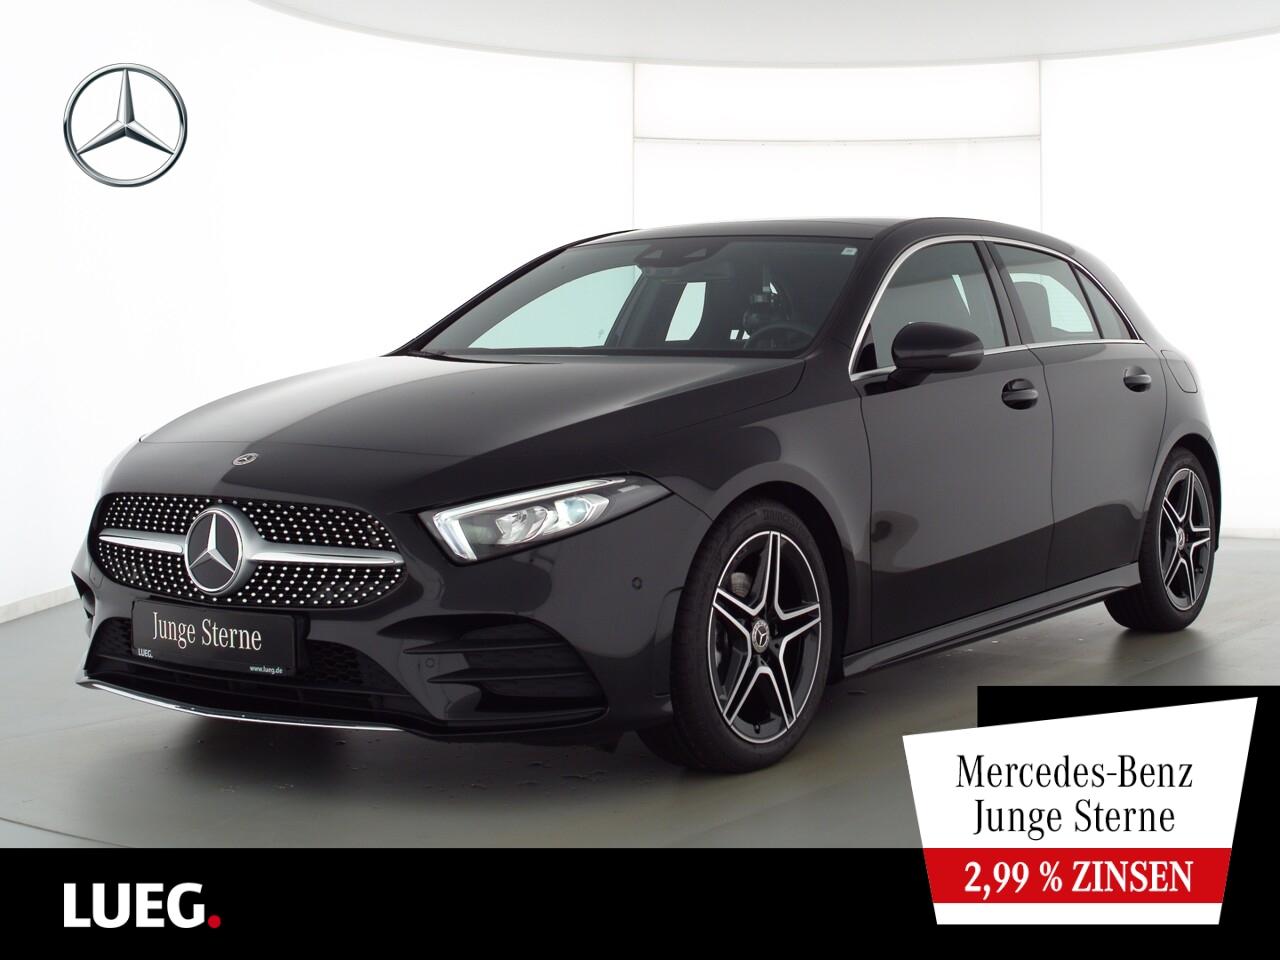 Mercedes-Benz A 180 AMG+MBUXHighEnd+Pano+LED-HP+AParkAssistent, Jahr 2020, Benzin